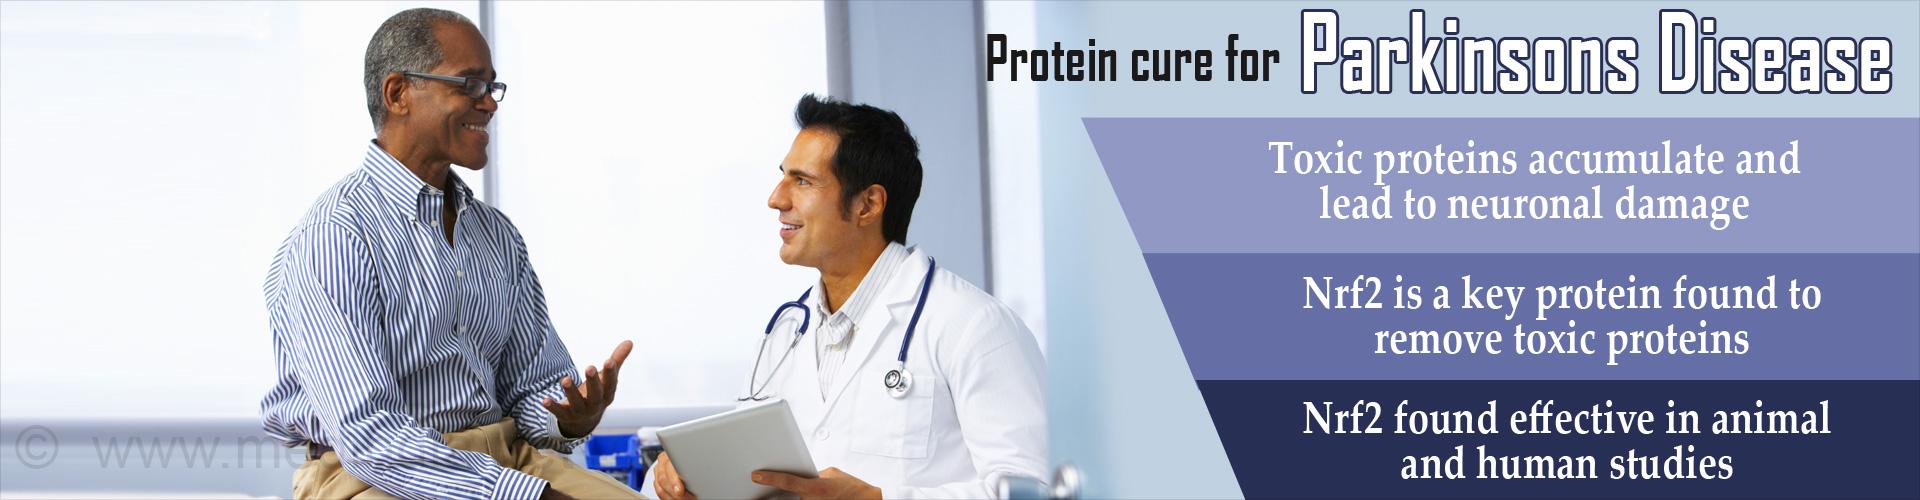 Protein Found  Effective Against Parkinson�s Disease